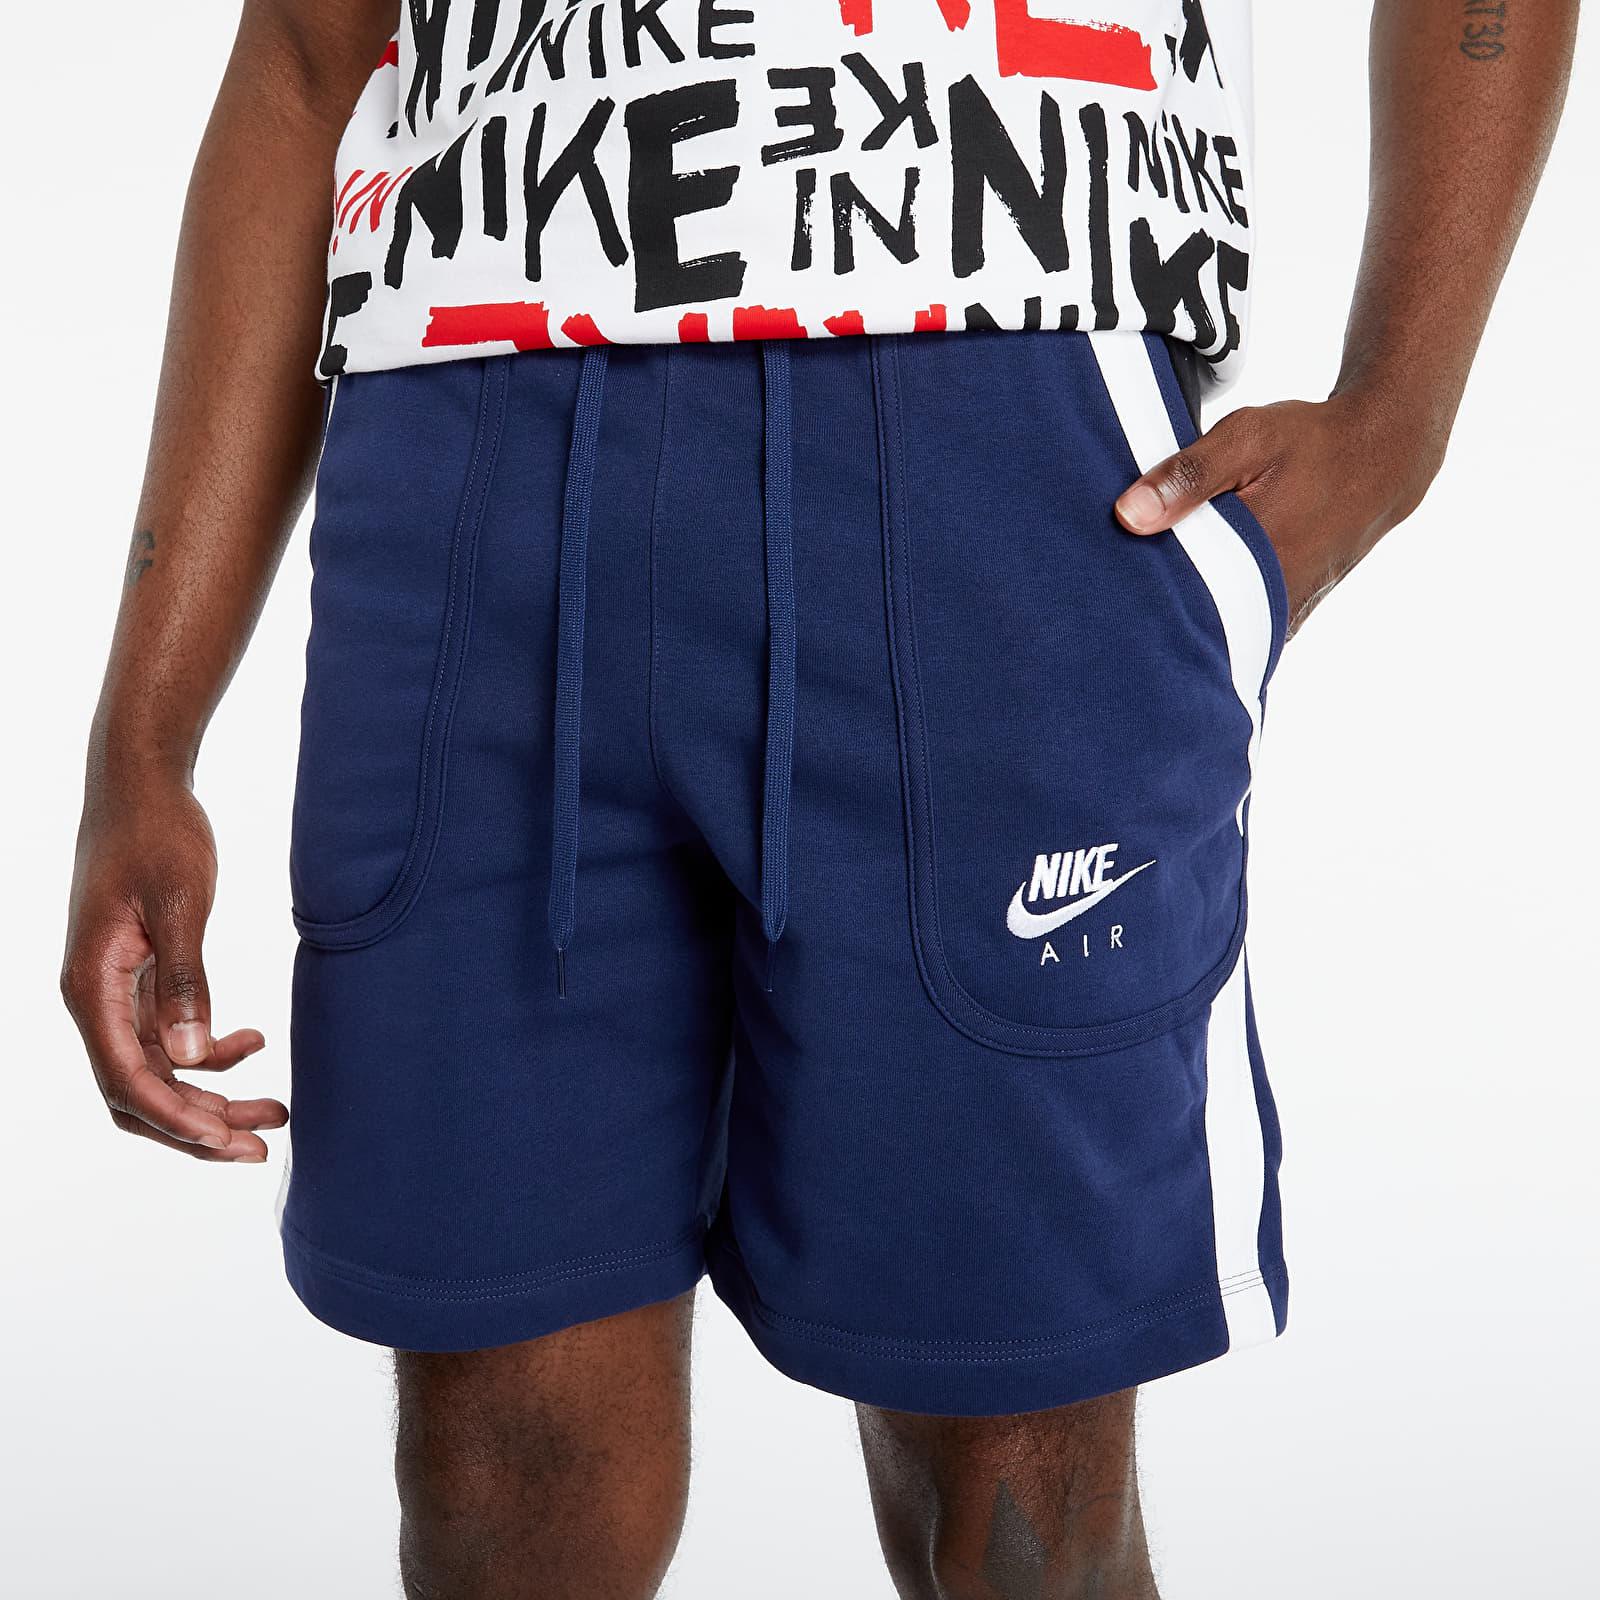 Nike Sportswear Nike Air French Terry Fleece Shorts Midnight Navy/ Black/ White S